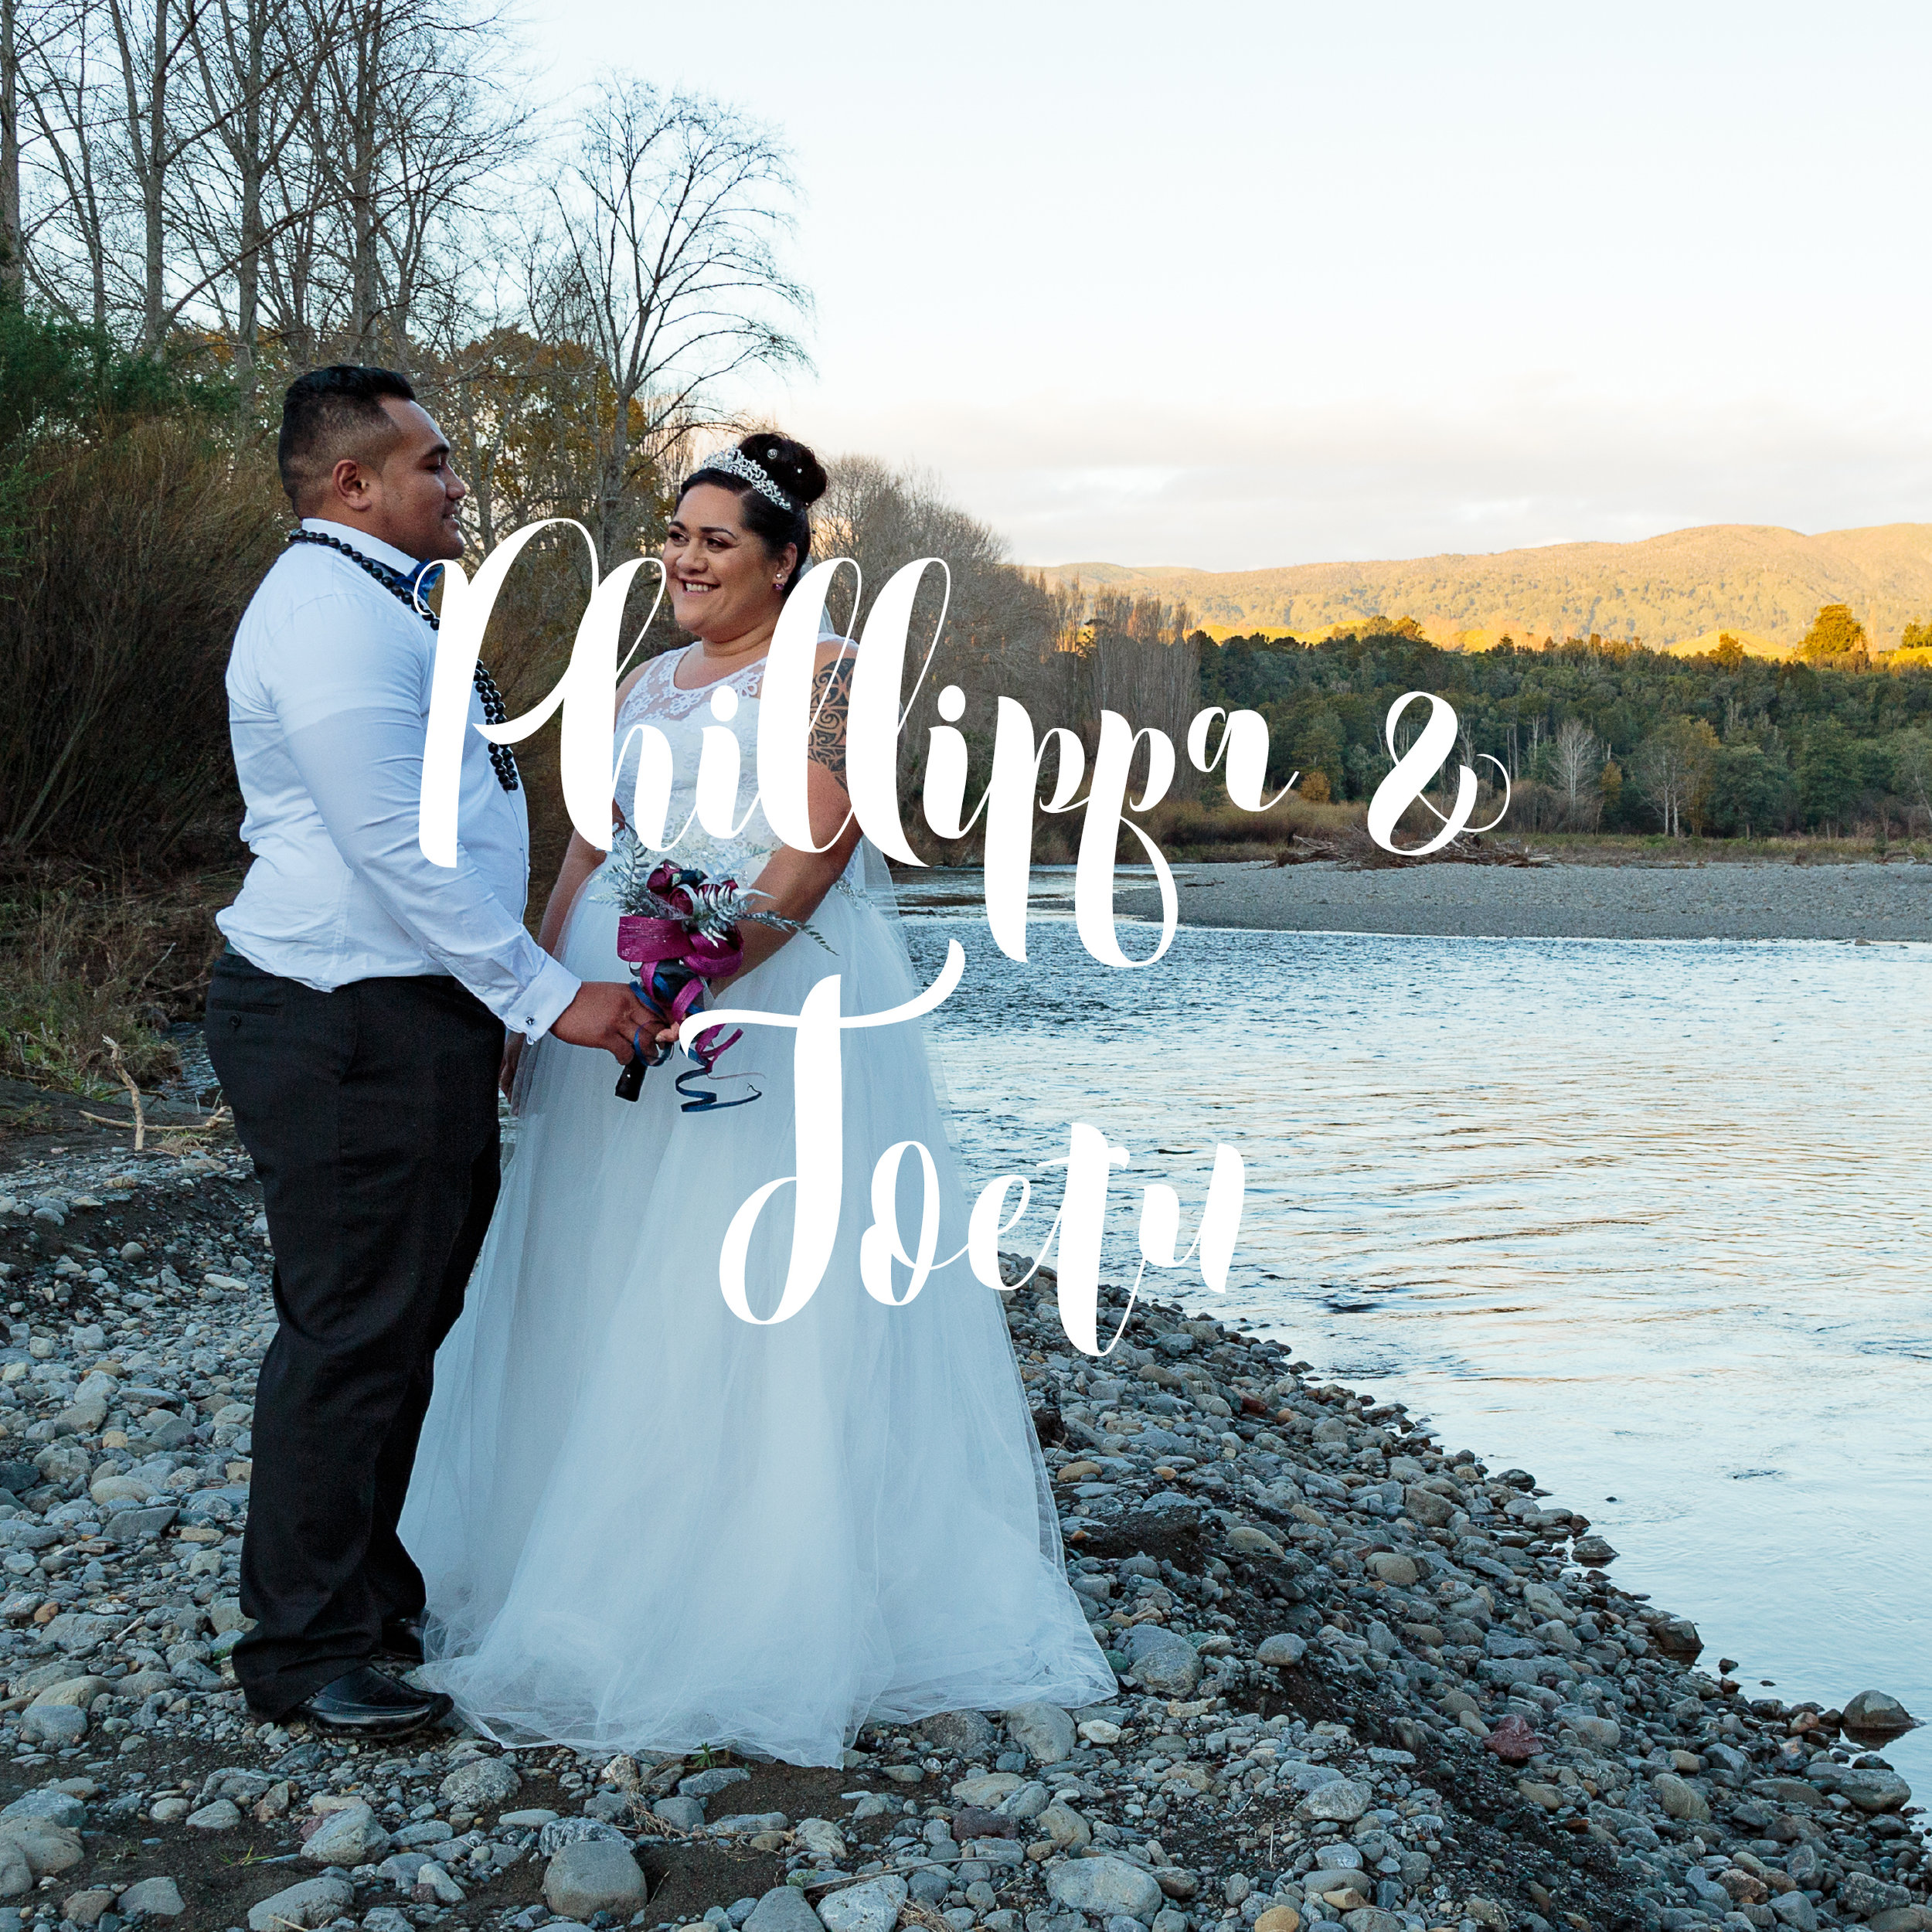 Highlight-wedding-photography-new-zealand-pohongina-valley-totara-reserve